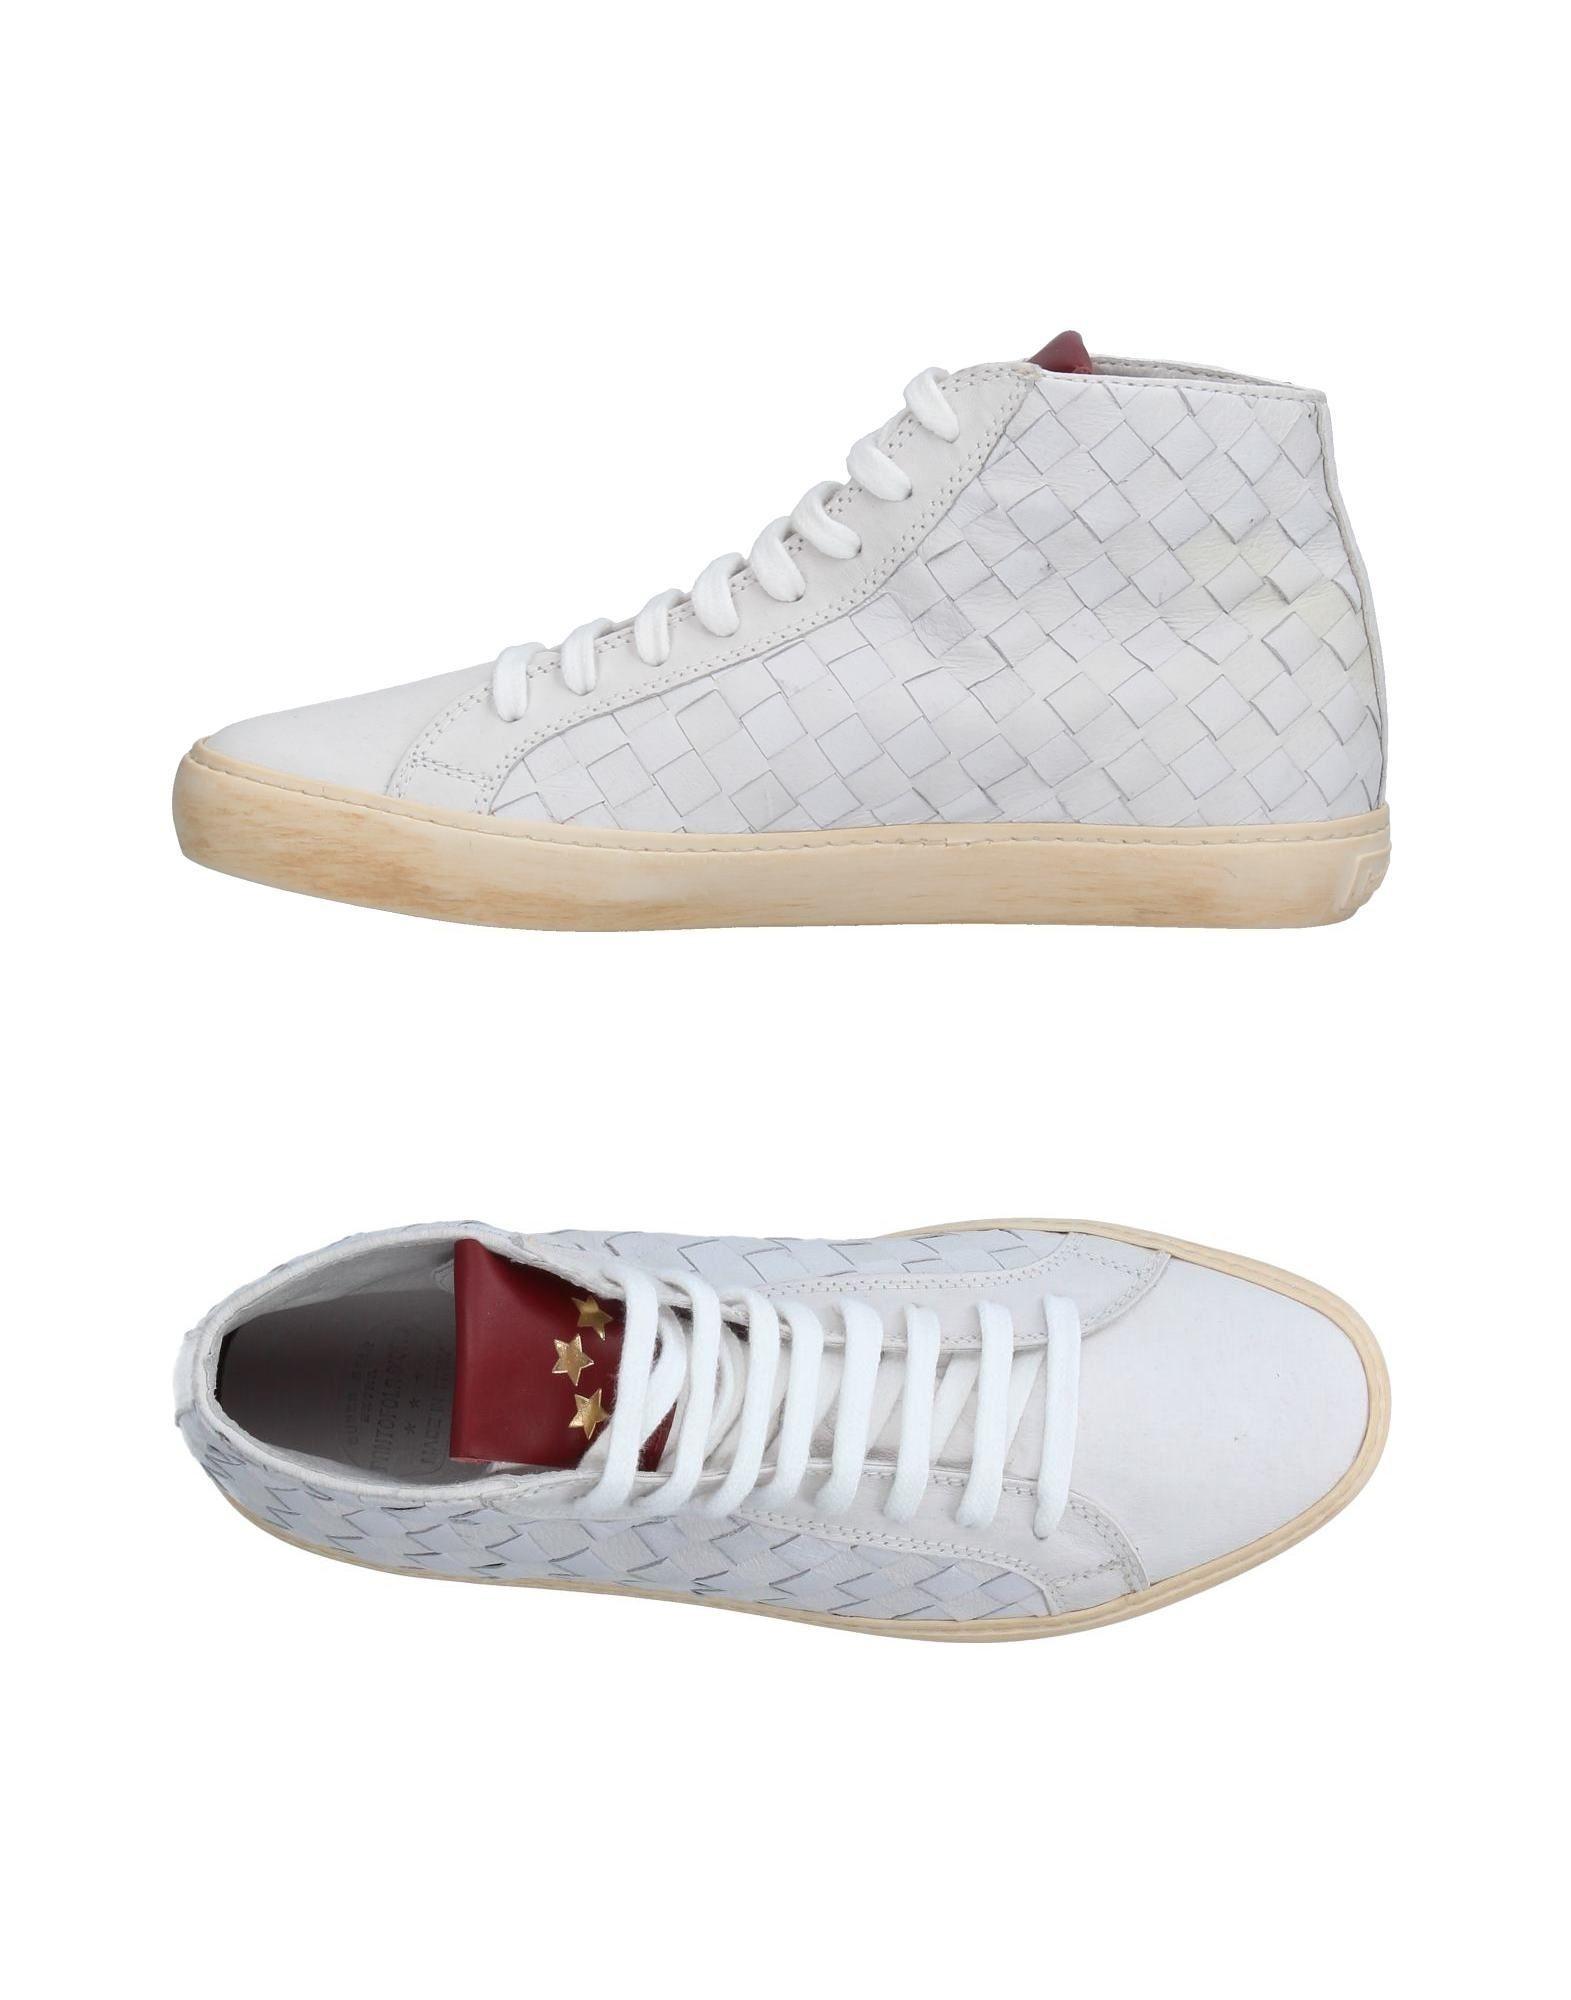 Scarpe da Ginnastica Pantofola D'oro Donna - 11221077LX